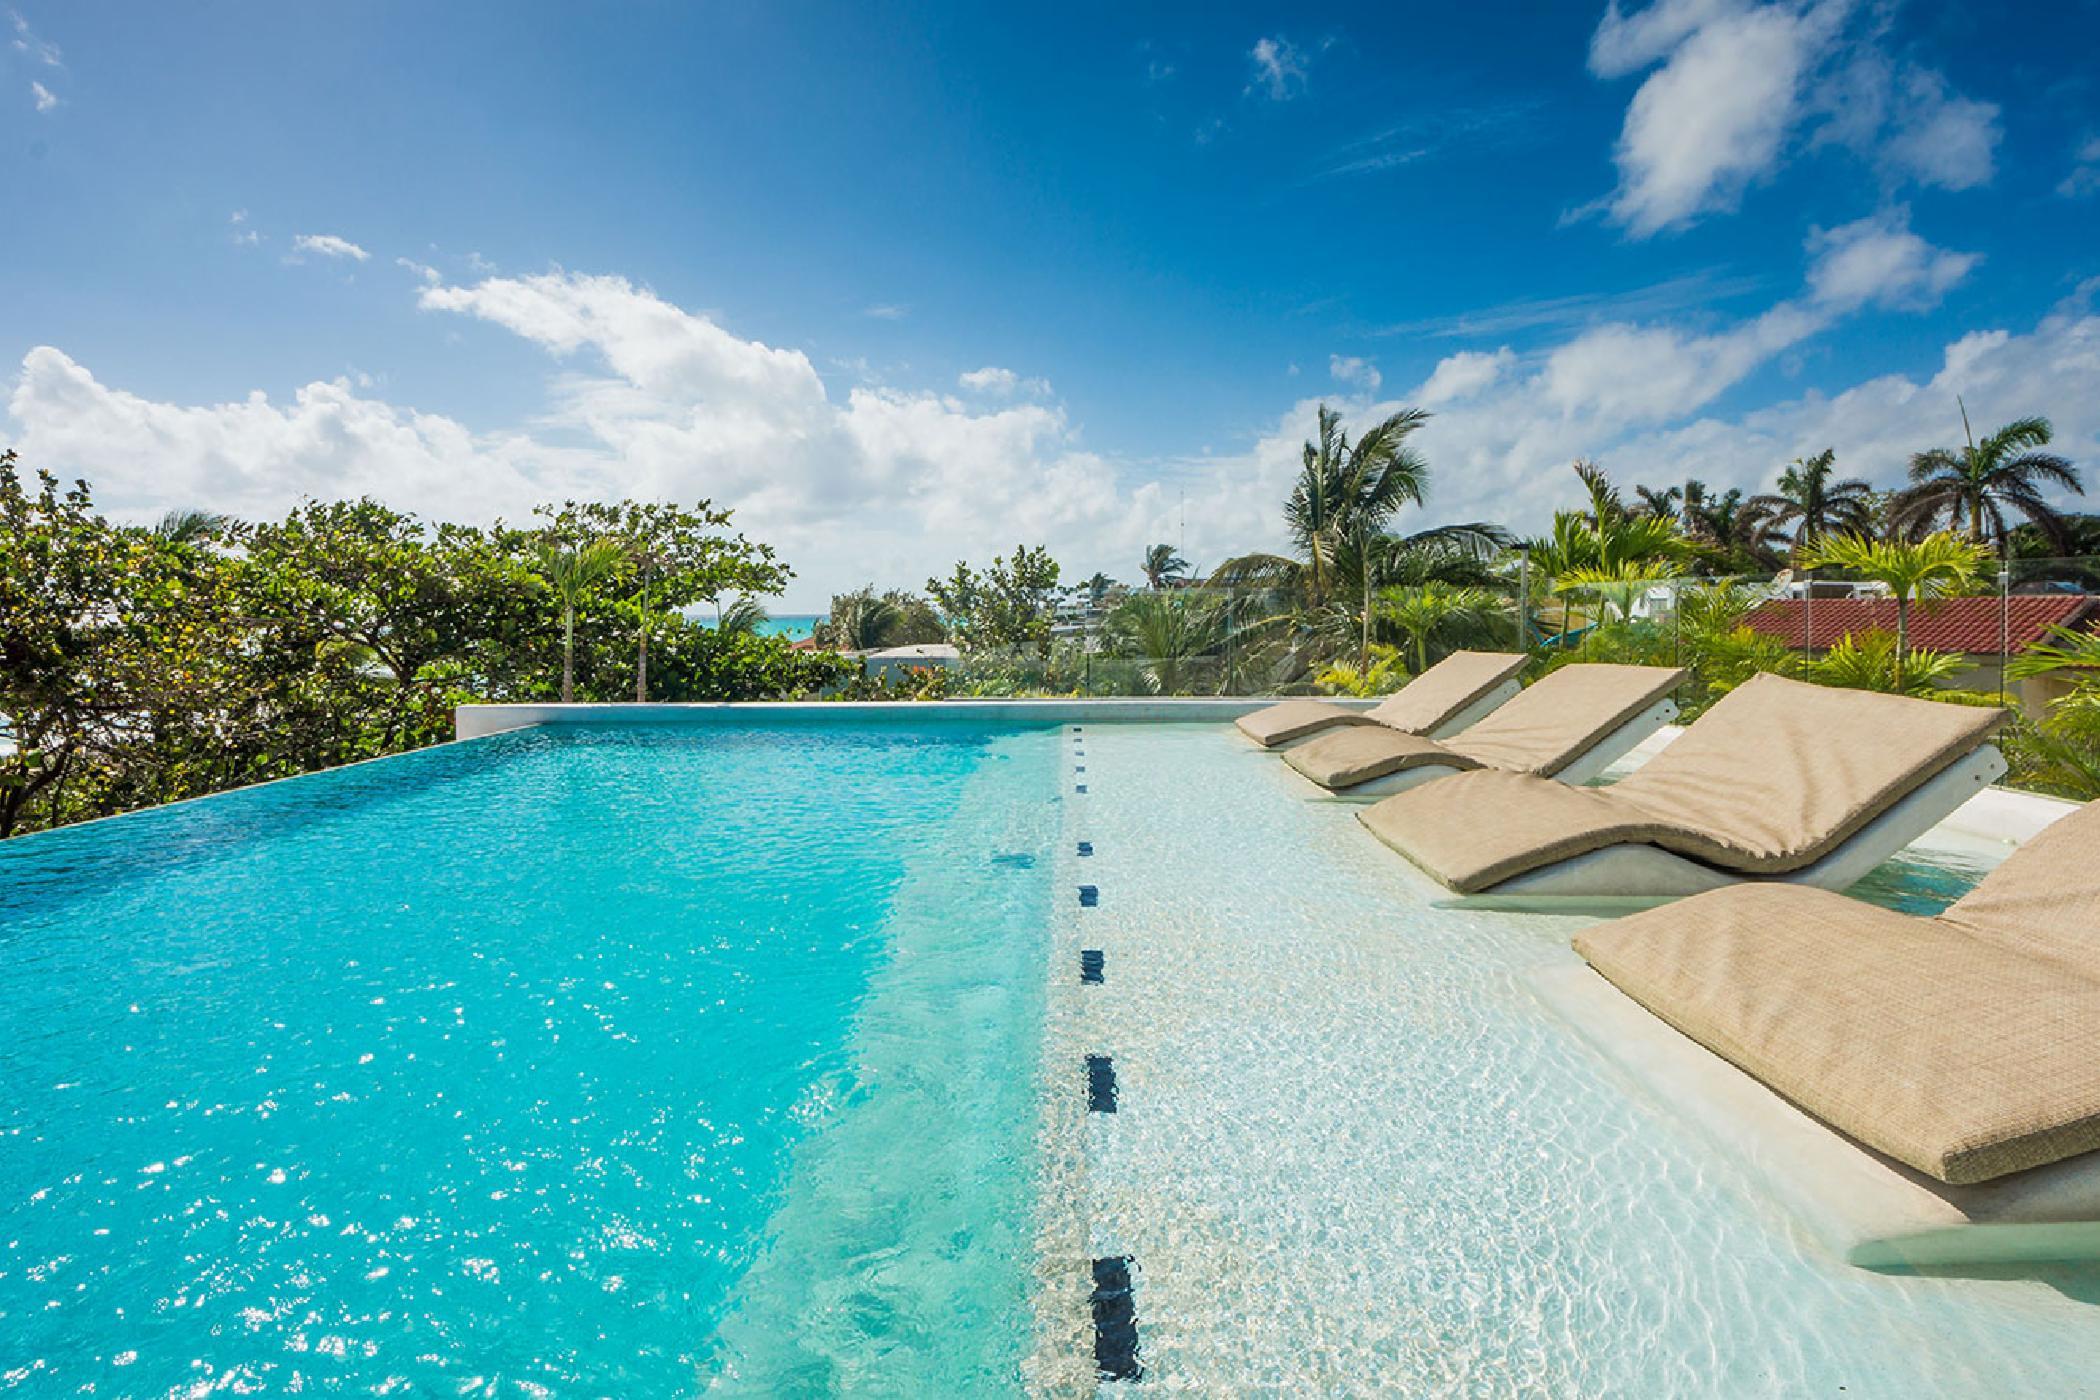 Maya_Luxe_Riviera_Maya_Luxury_Villas_Experiences_Vista_Hermosa_13.jpg